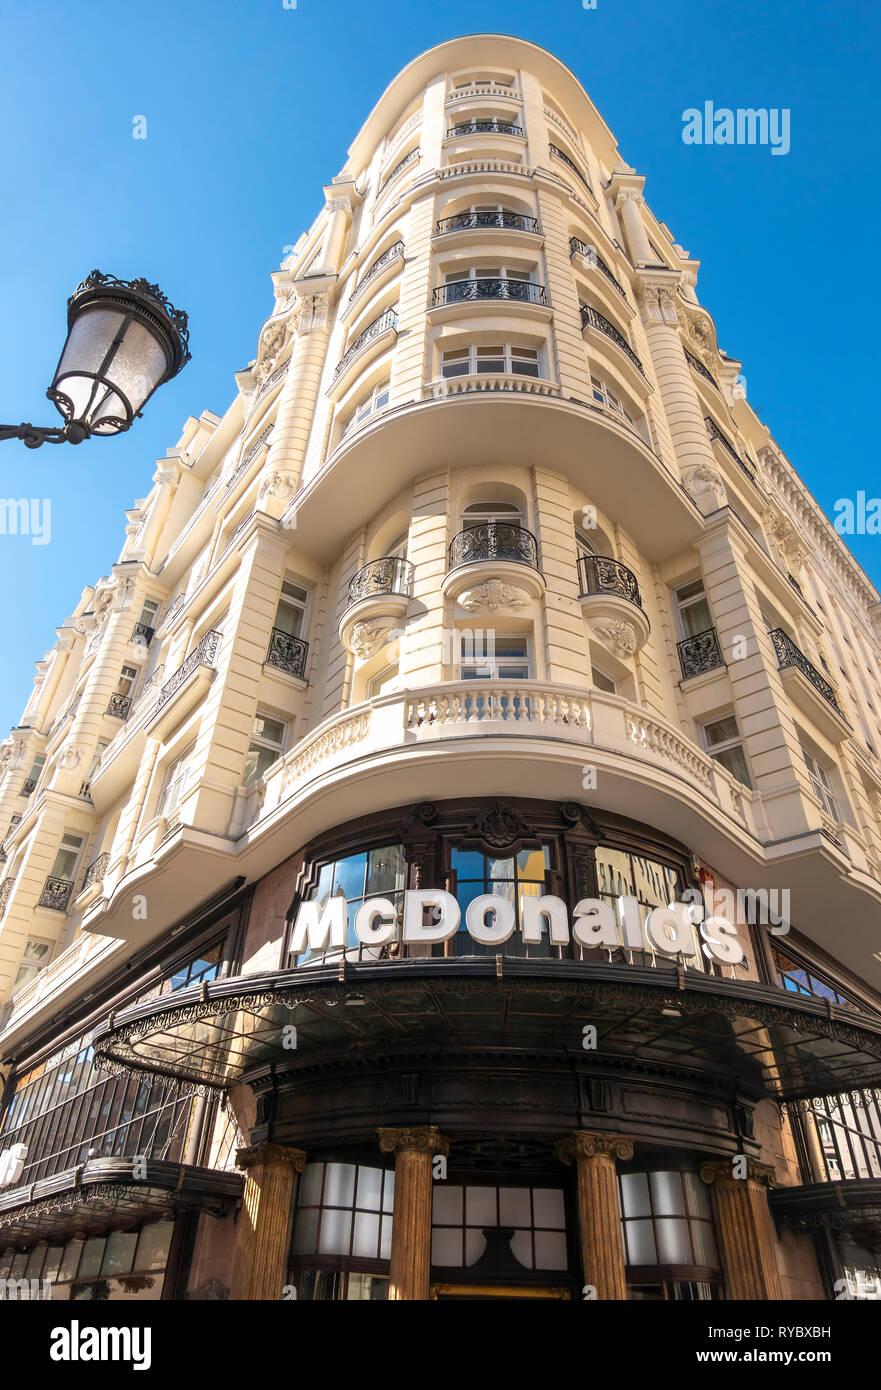 McDonalds restaurant on the corner of Gran Via and Calle de la Montera in Madrid Spain Europe. Stock Photo